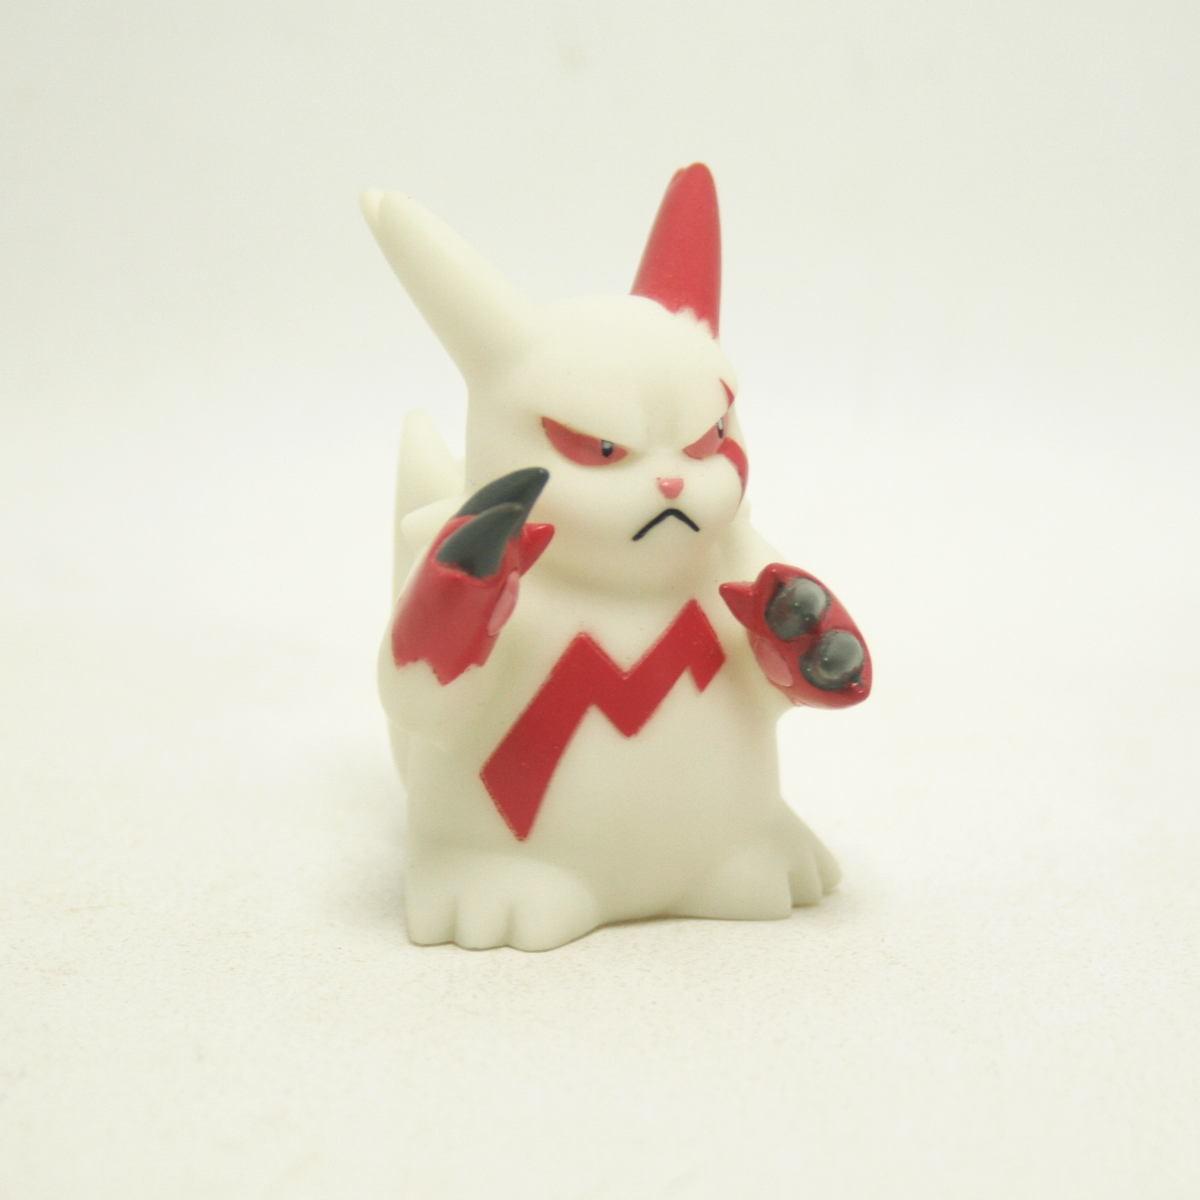 Pokemon Mini Figure Zangoose Importado do japão